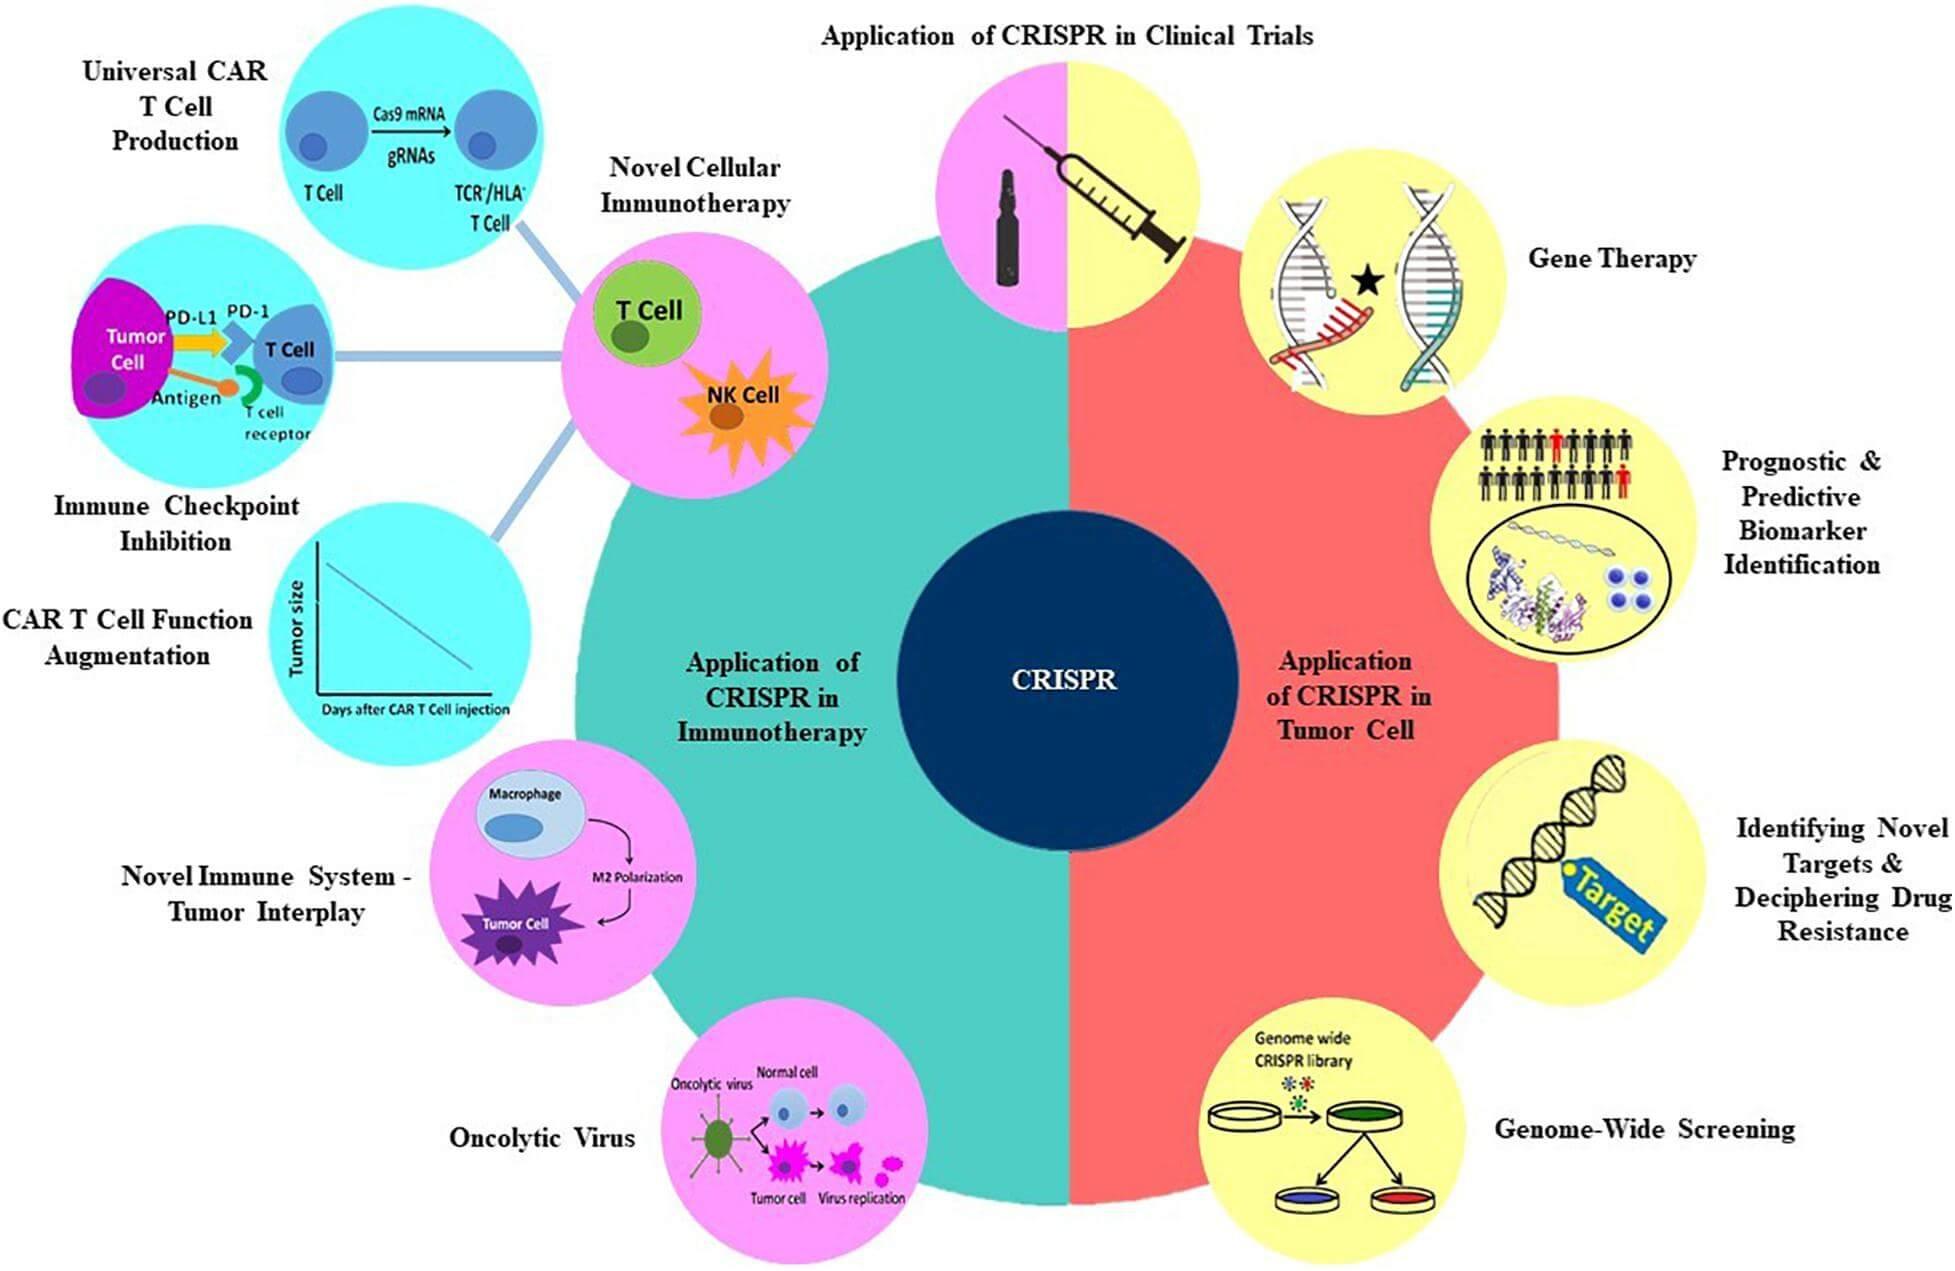 CRISPR oncologie aplicatii